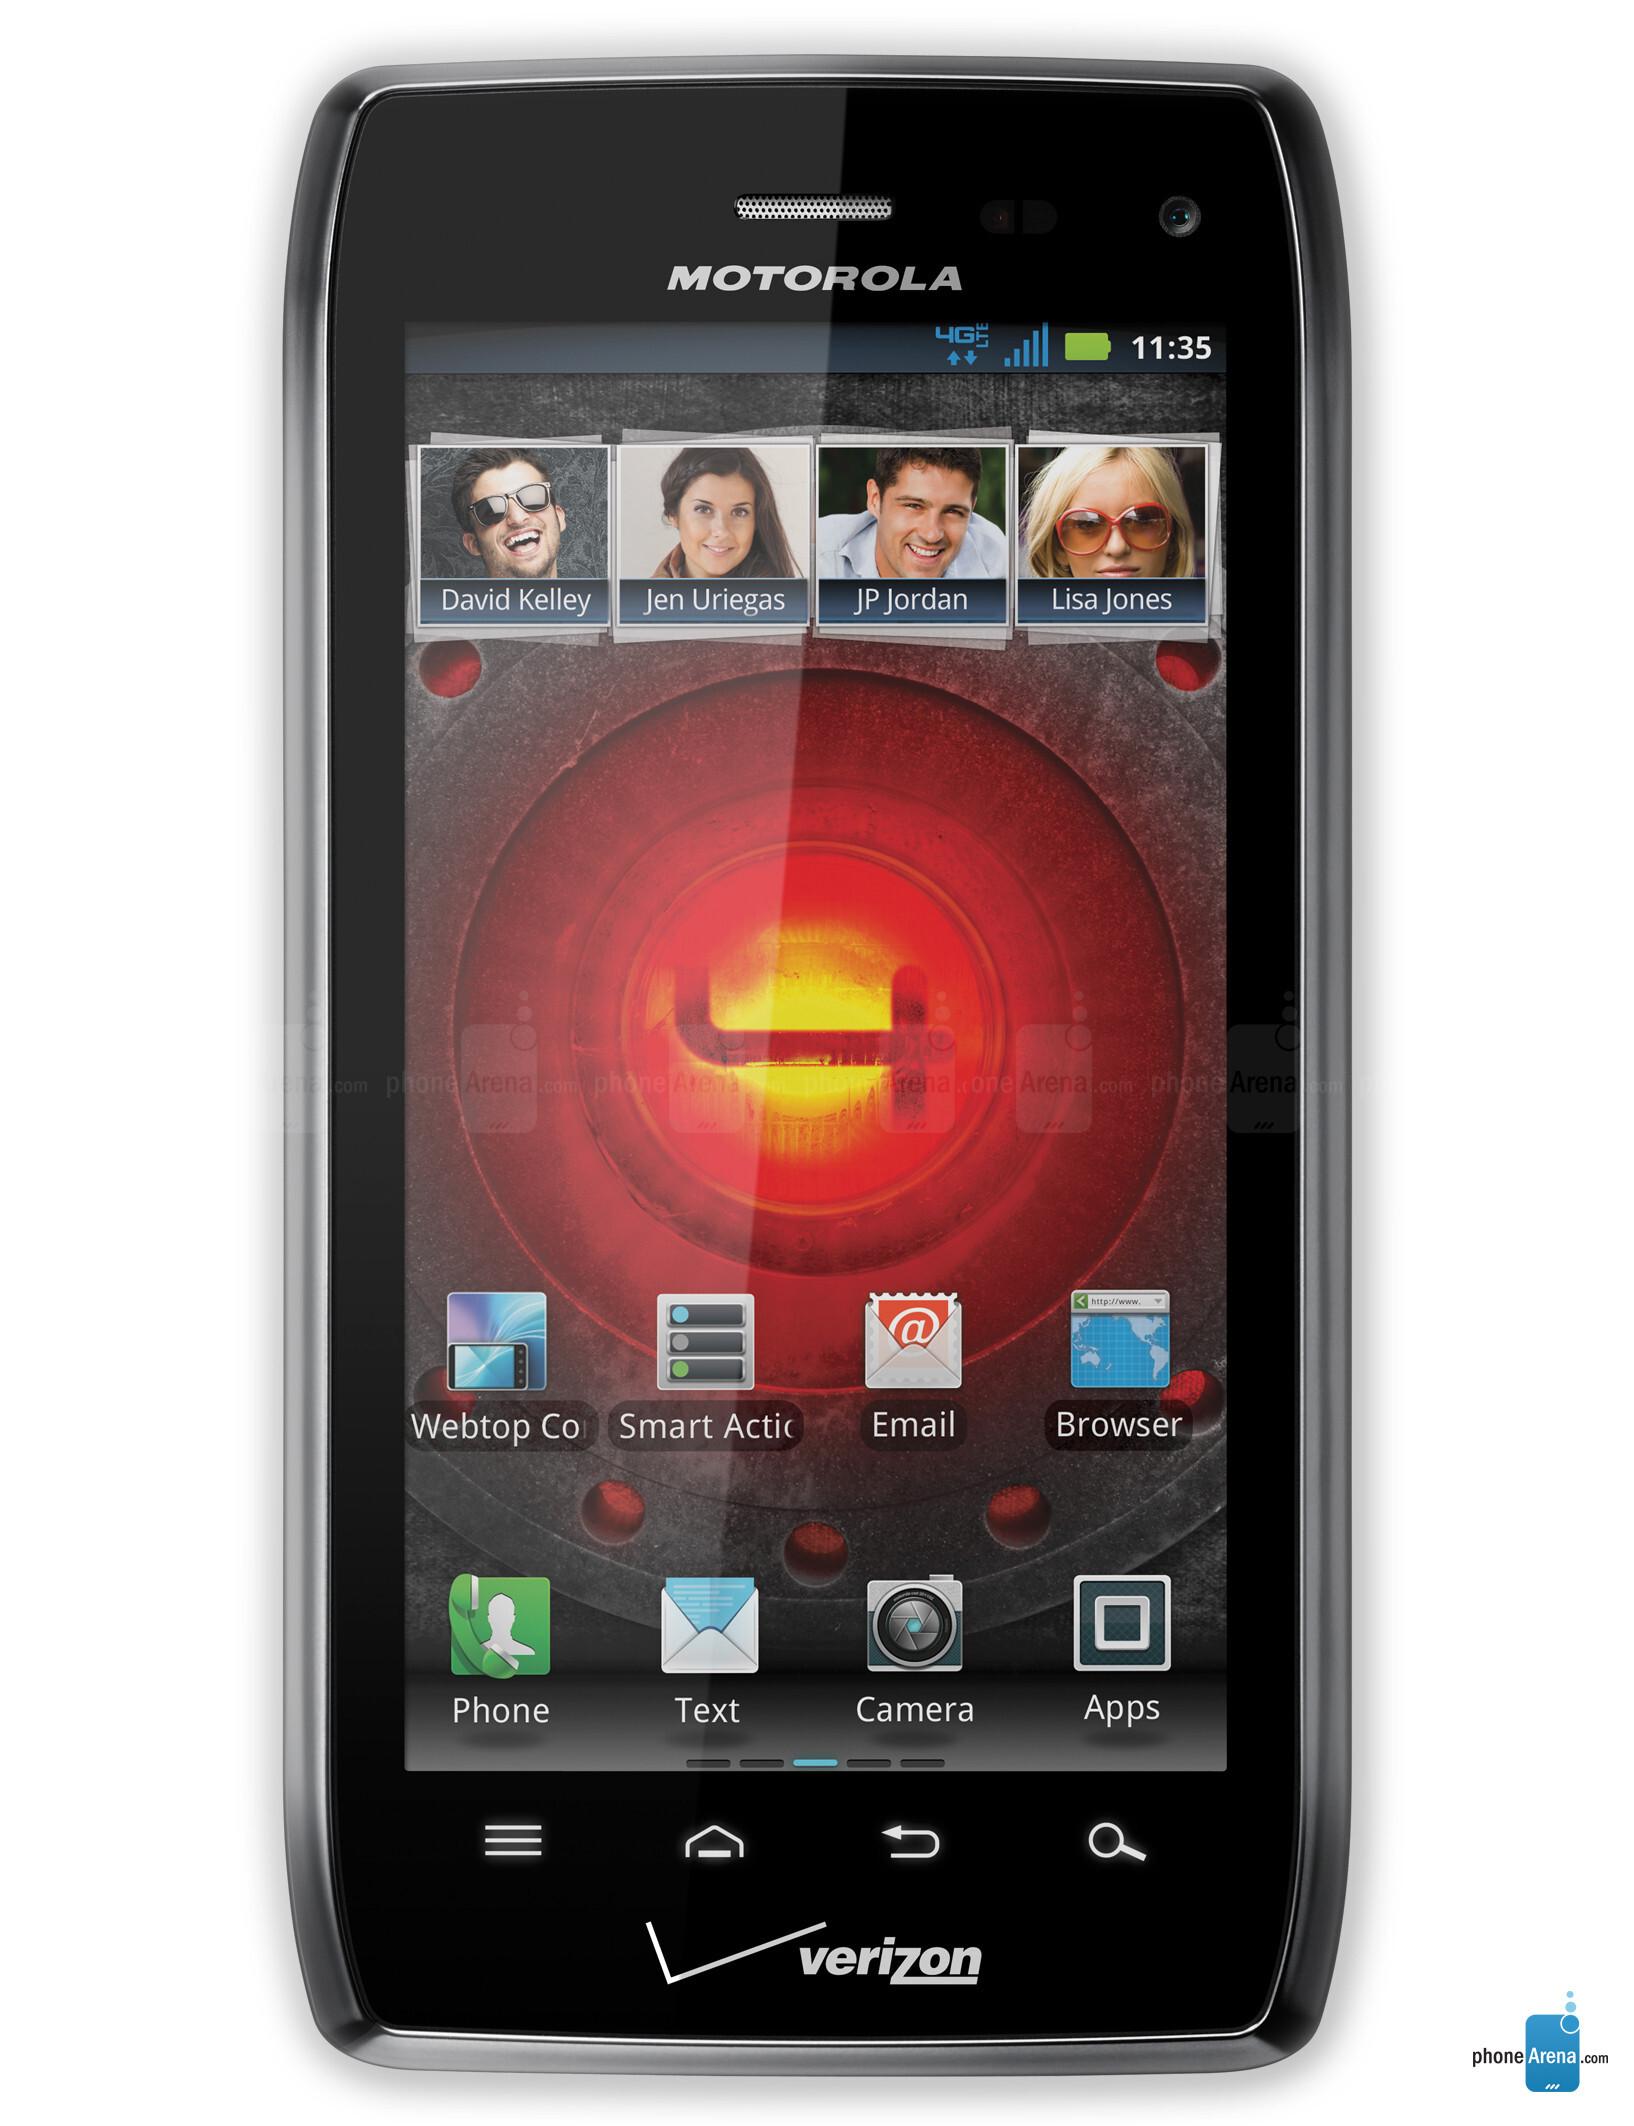 motorola droid 4 photos rh phonearena com Verizon Motorola Android Phones Verizon Motorola Android Phones